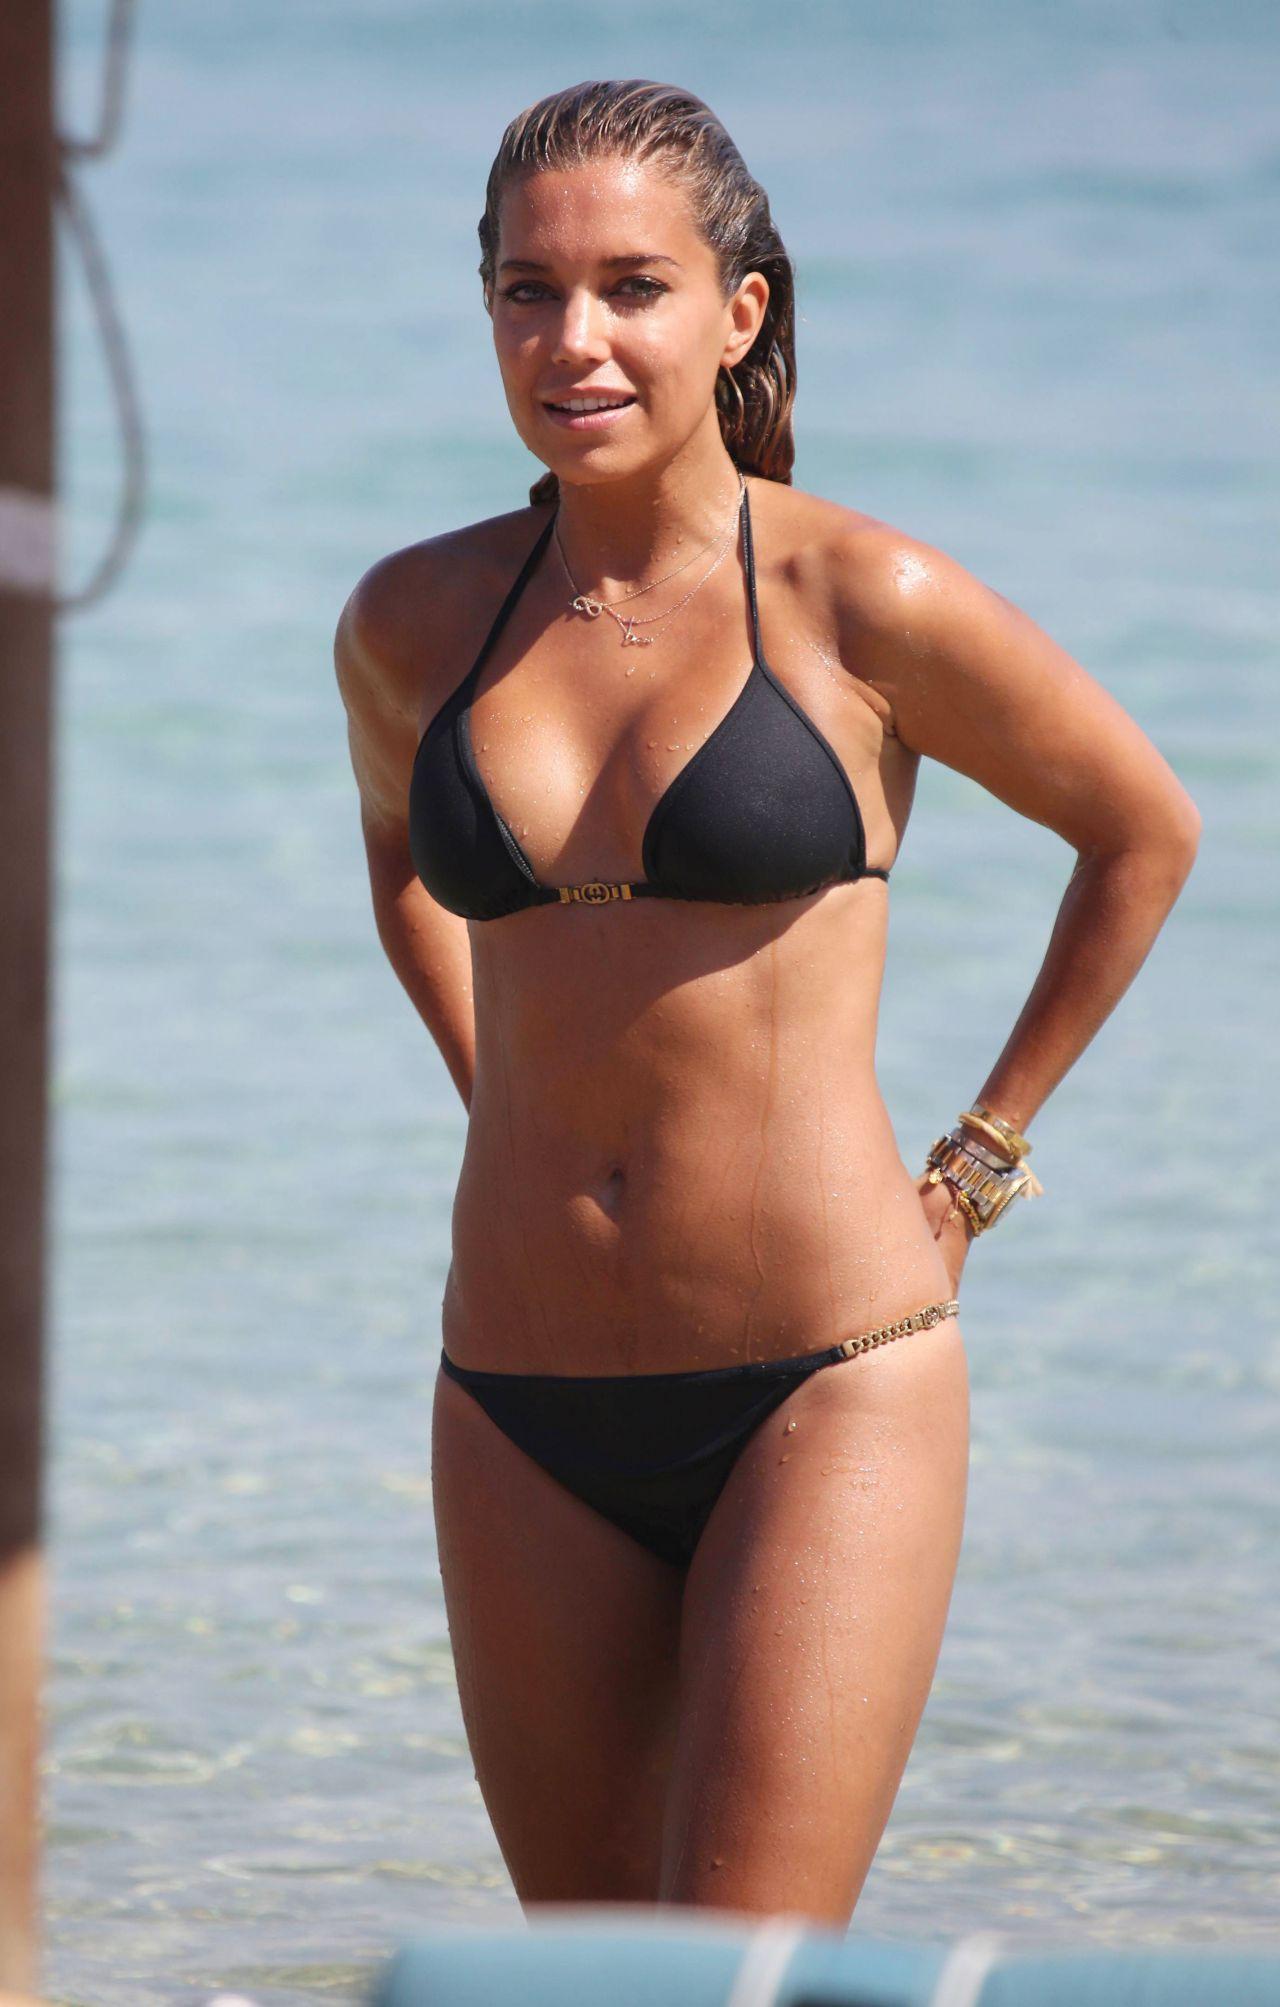 Sylvie Meis Hot In Black Bikini On The Beach In Mykonos